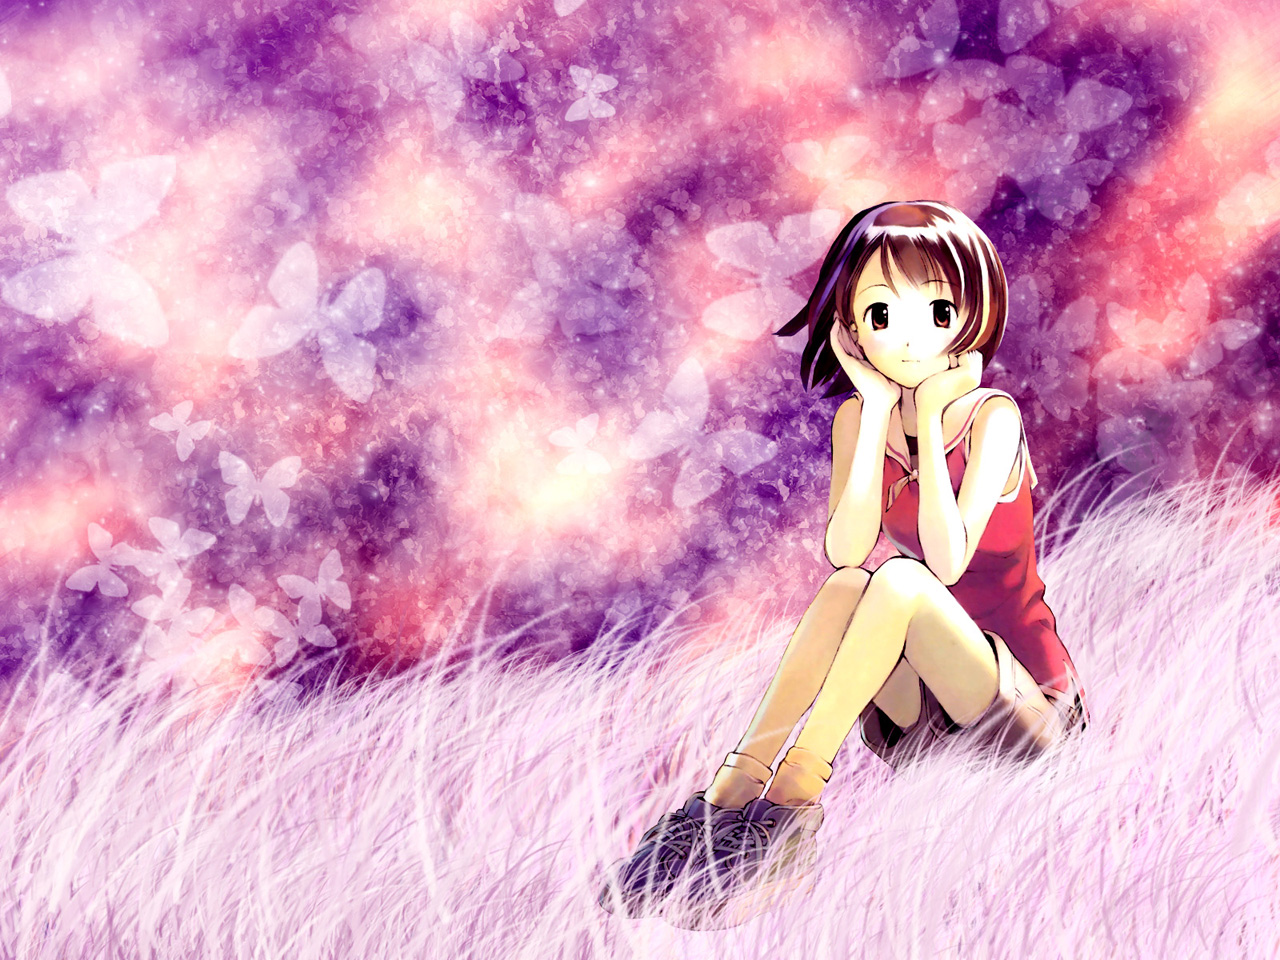 wallpaper of cute anime girl computer desktop wallpaper images 1280x960